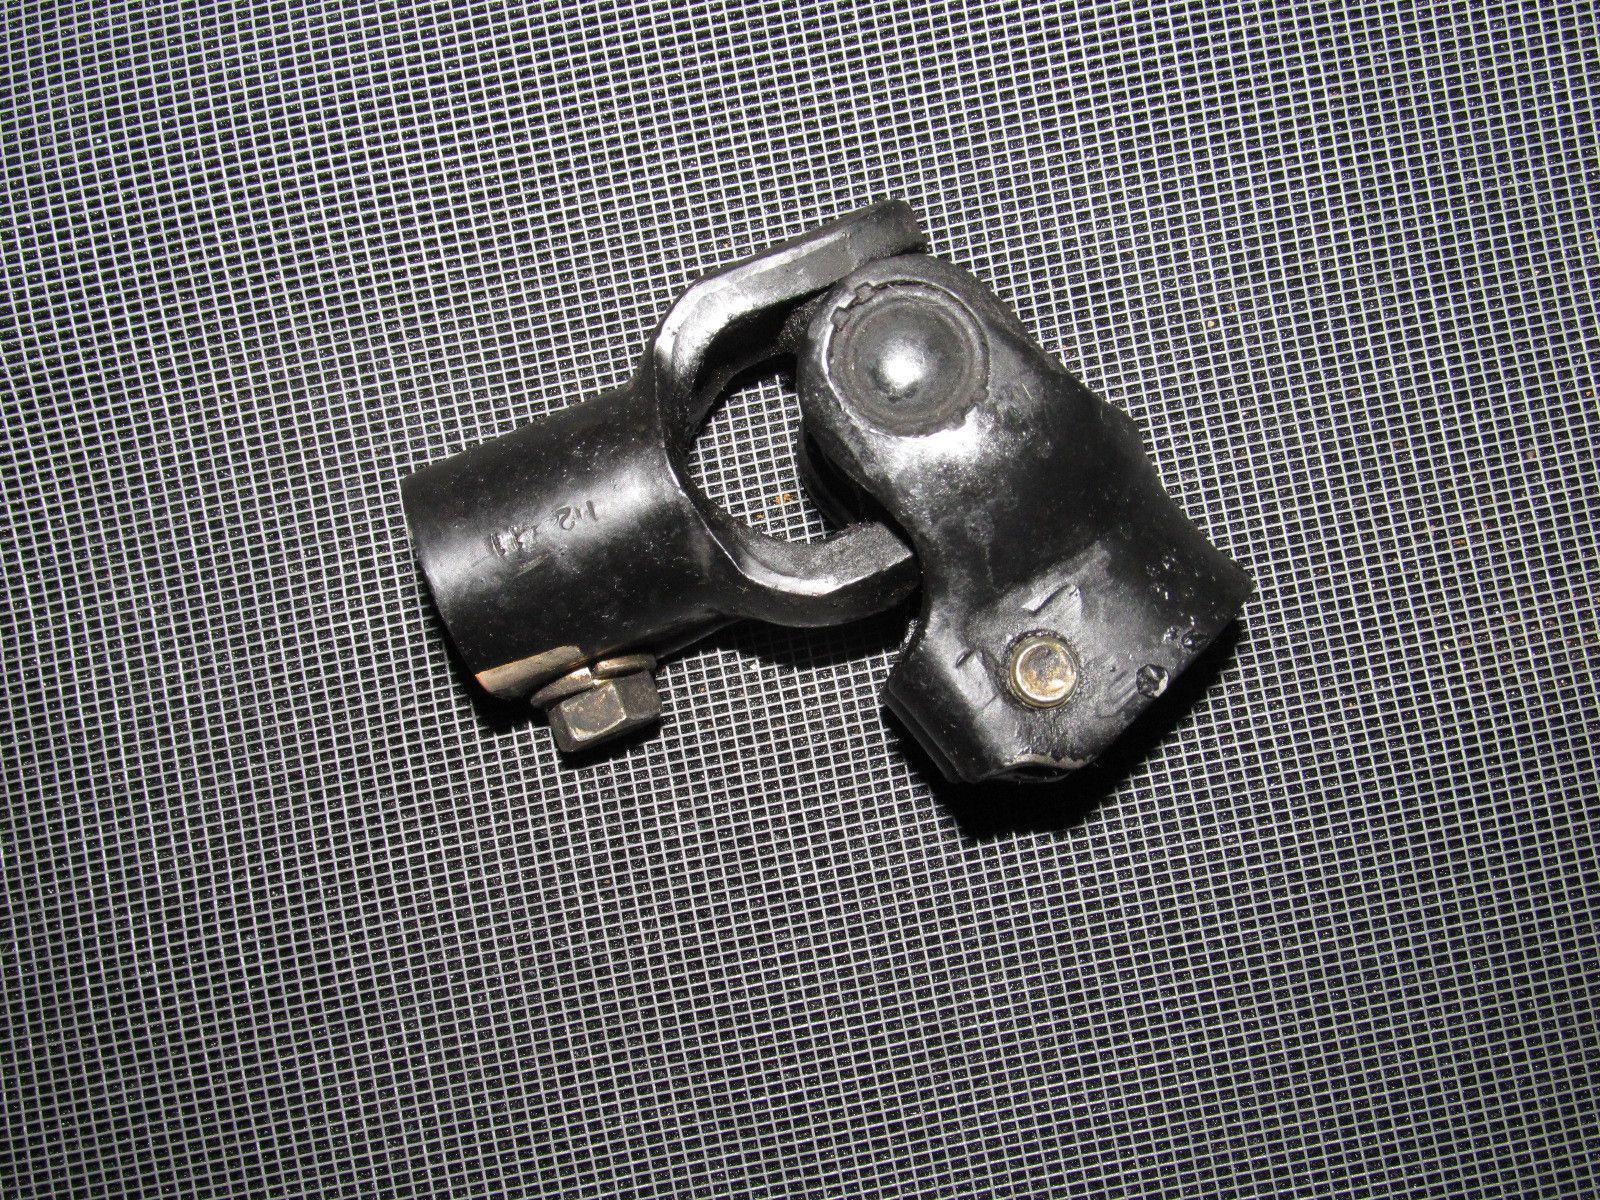 hight resolution of 89 90 91 92 93 94 nissan 240sx oem steering column u joint coupler